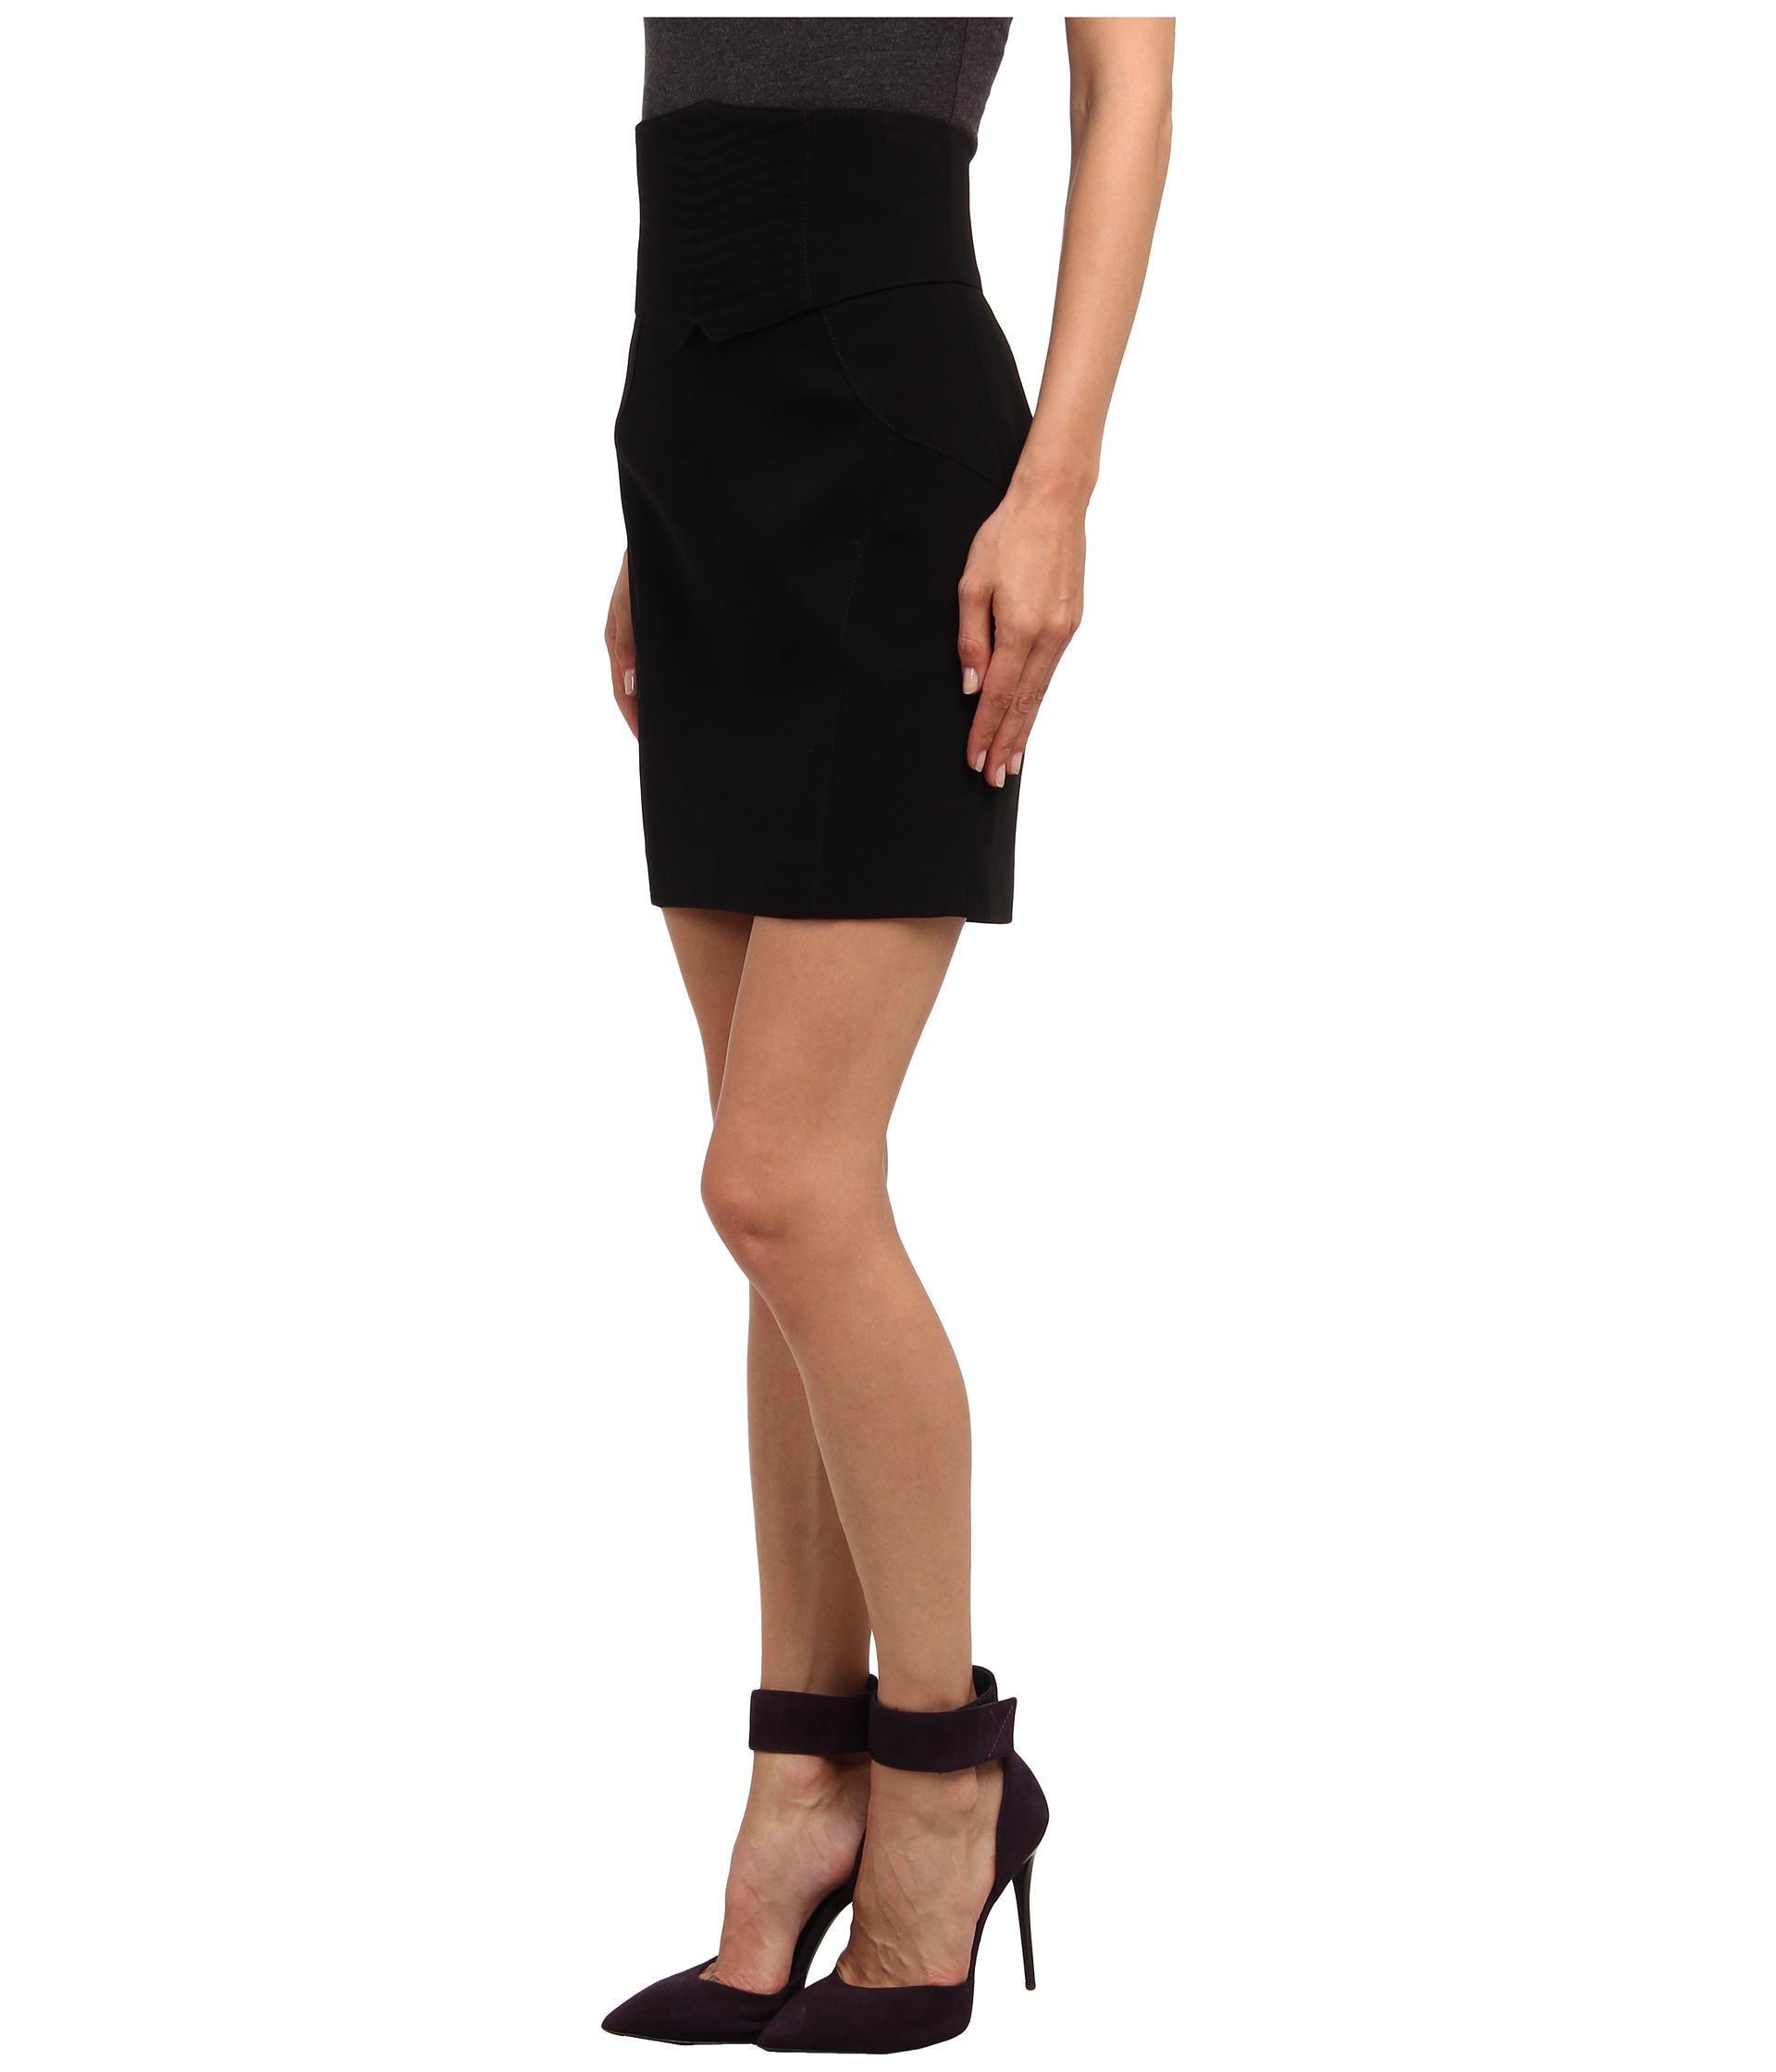 Pierre Balmain Short Pencil Skirt, Clothing | Shipped Free at Zappos